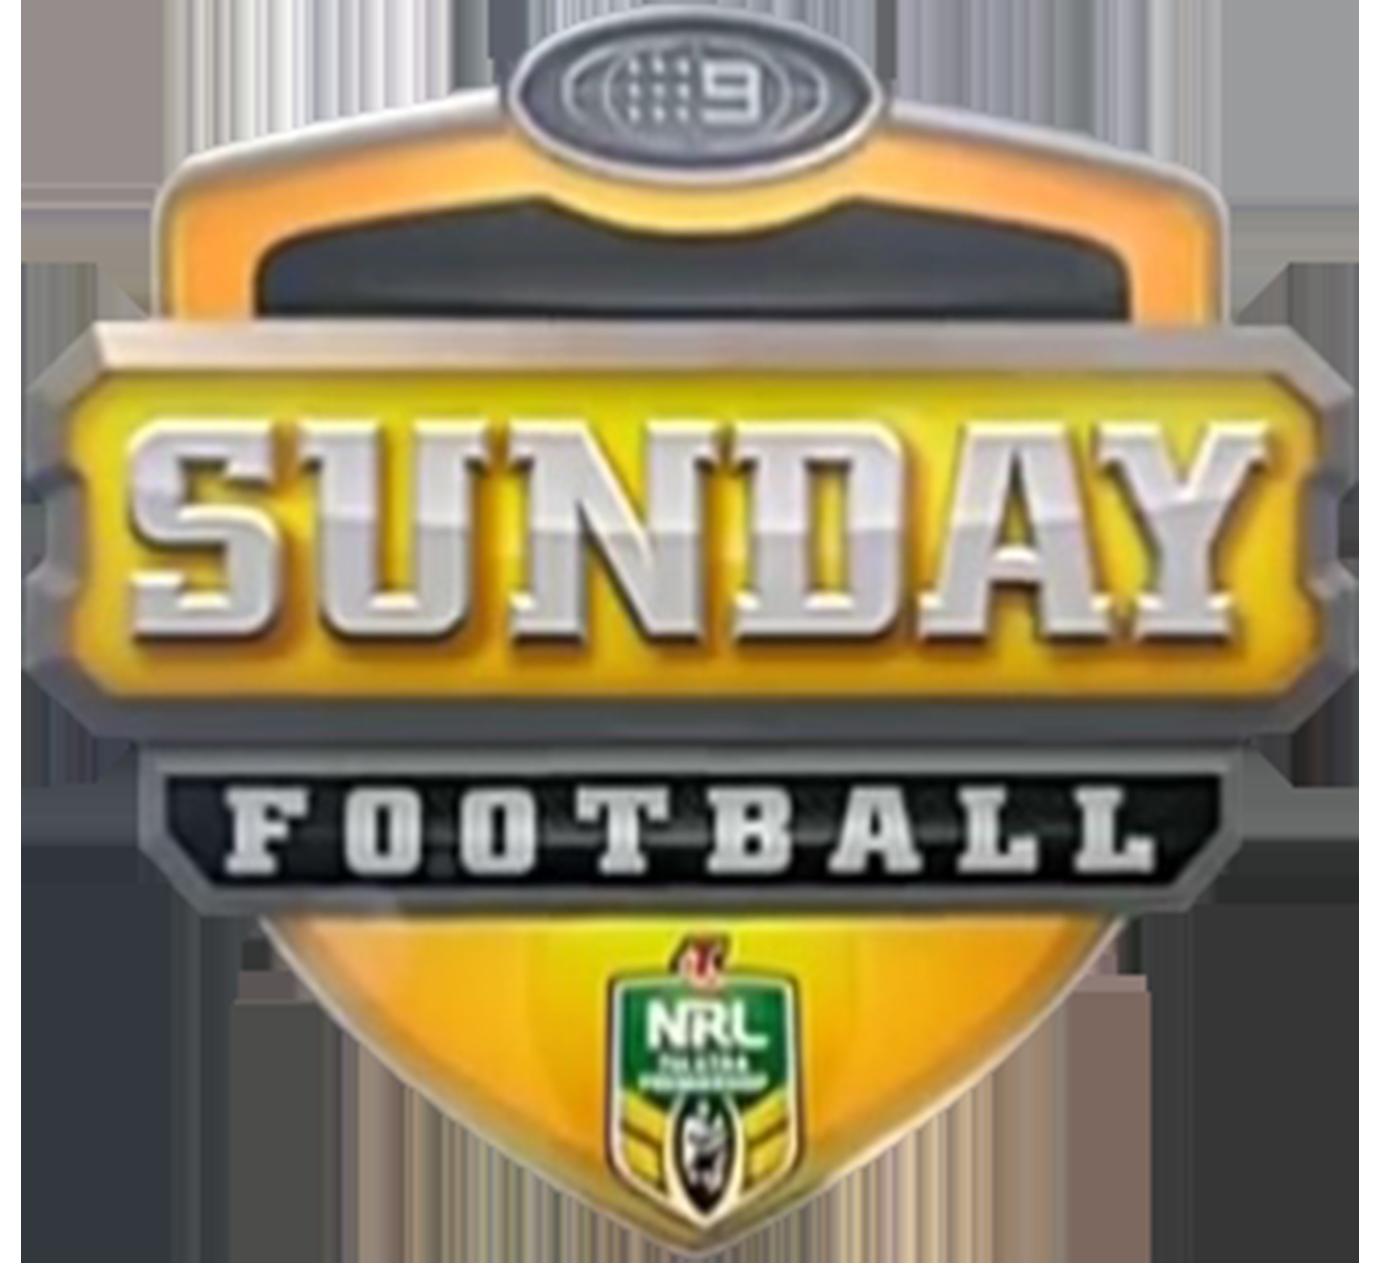 Sunday Football Nrl Nine Network Logopedia Fandom